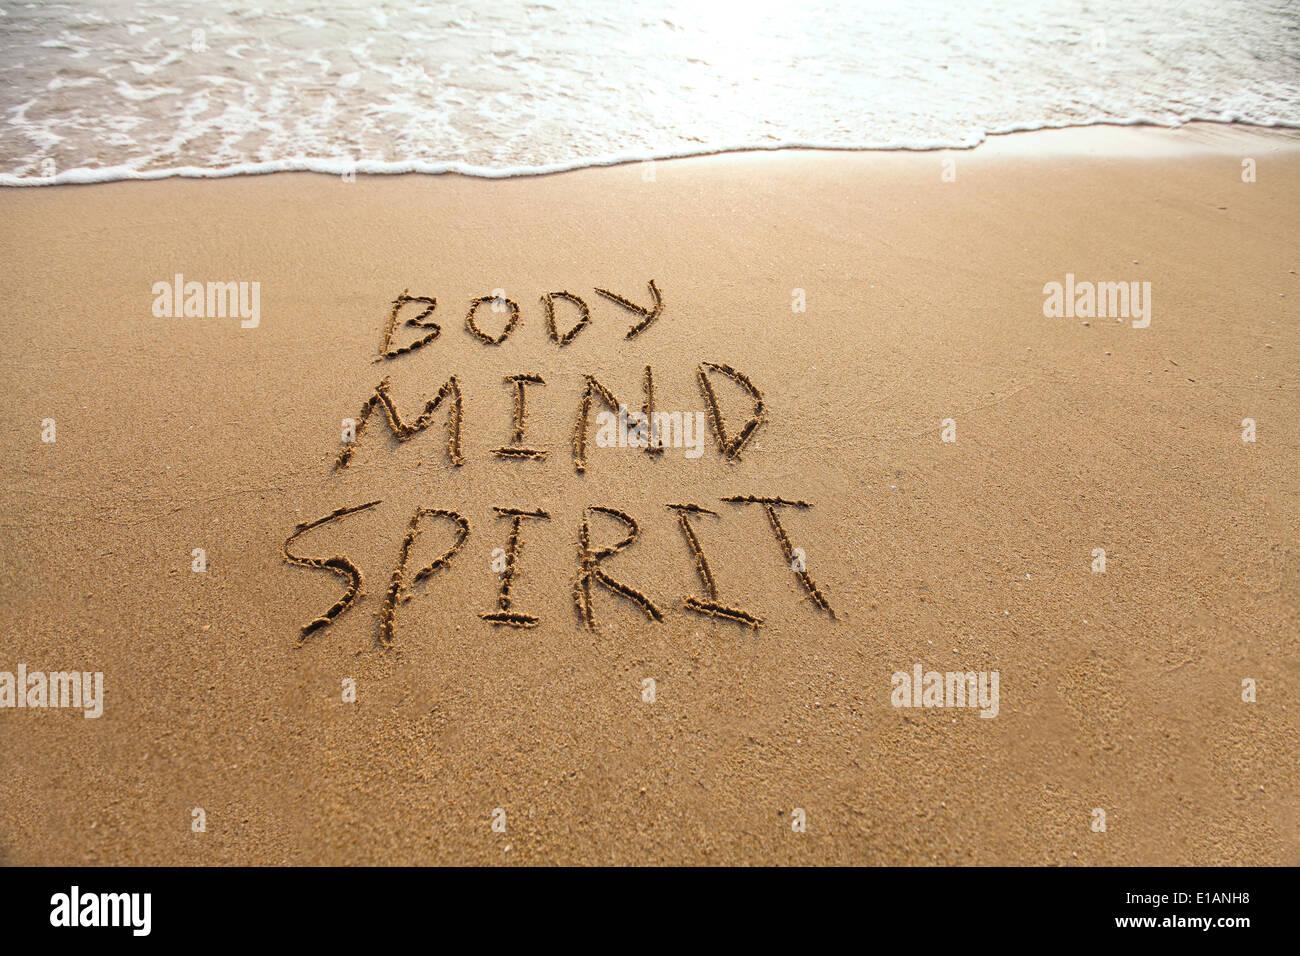 body, mind and spirit - Stock Image